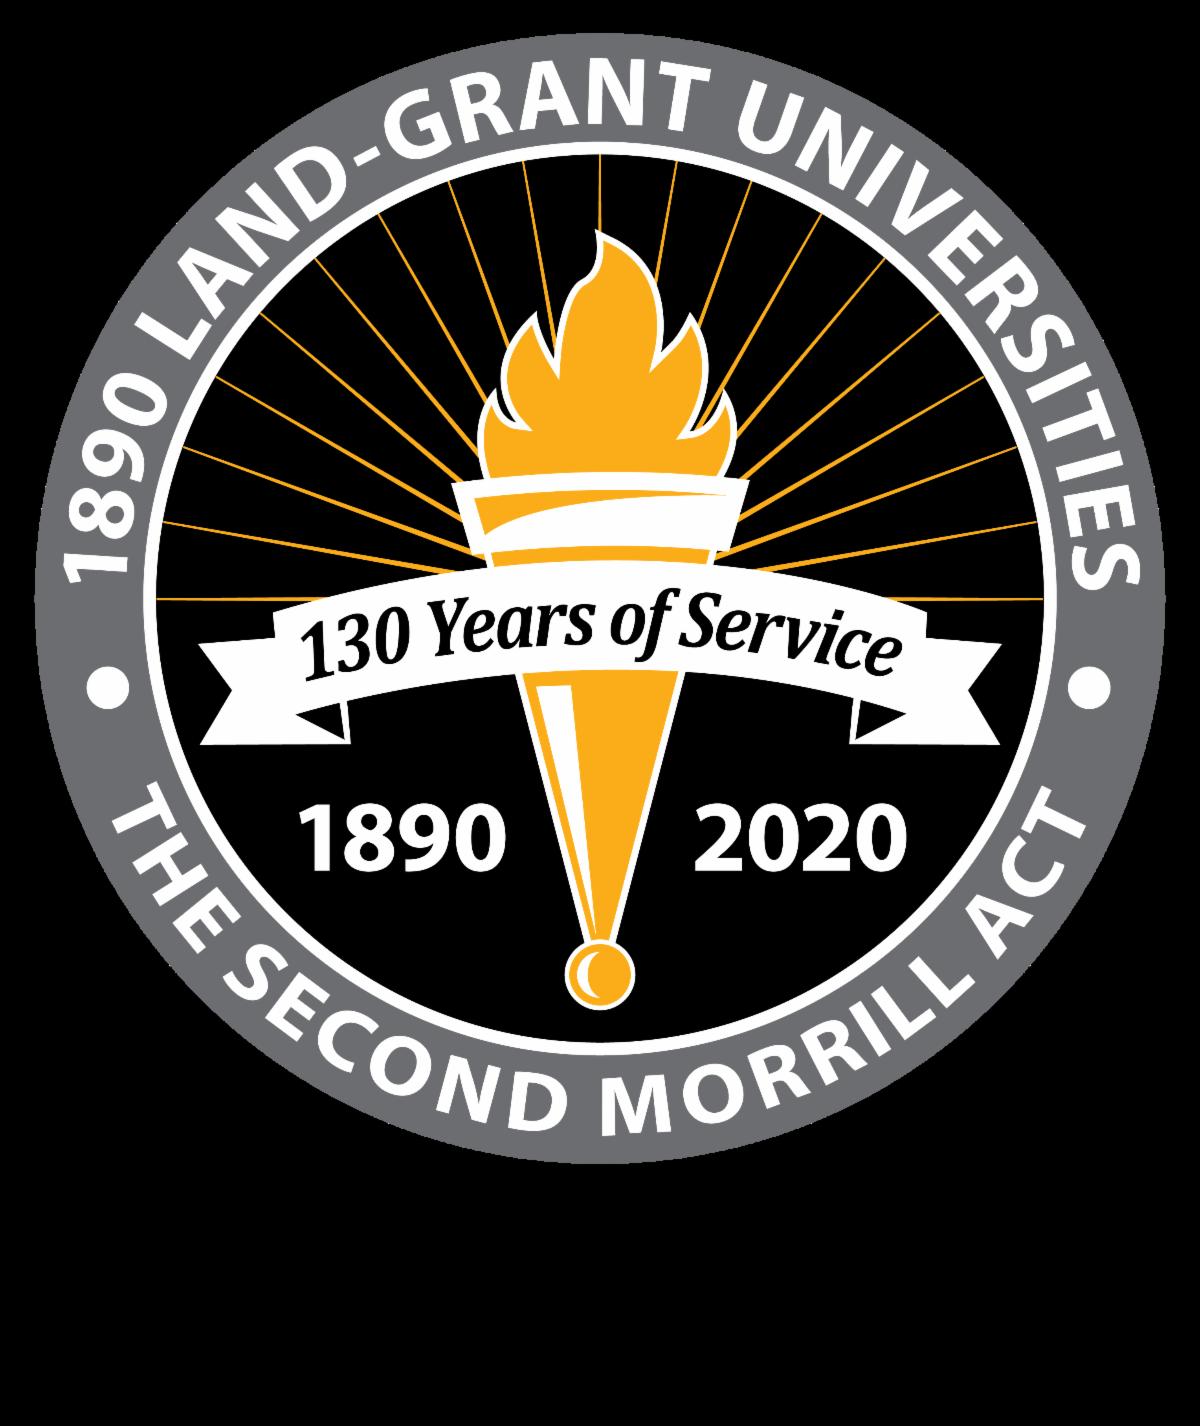 1890 Land-Grant Universities 130 Years of Service logo.